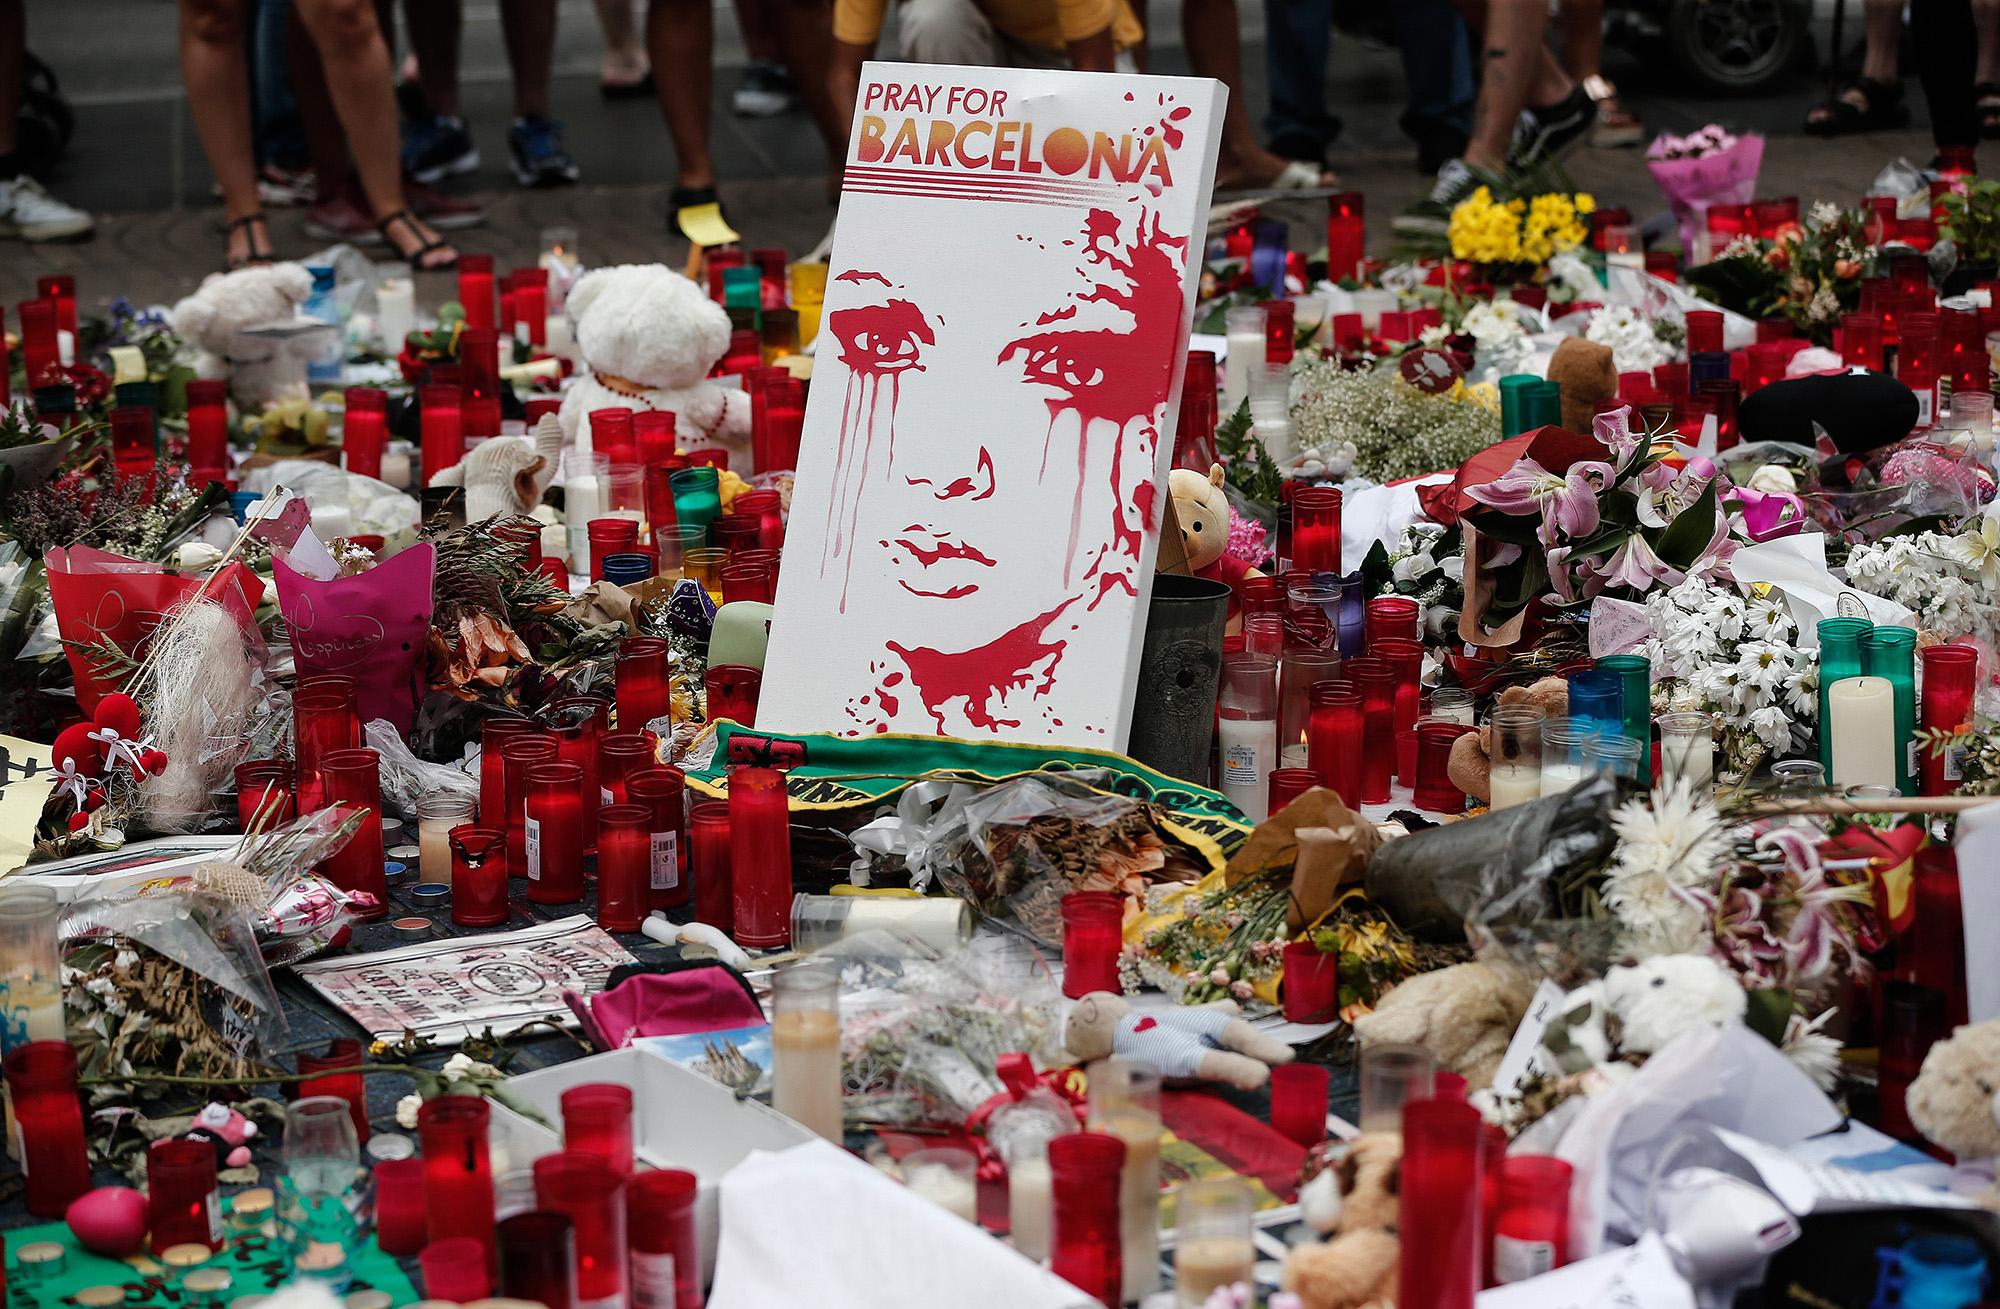 Barcelona, 2017 autusztus 19. (fotó: Burak Akbulut/Anadolu Agency/Getty Images)